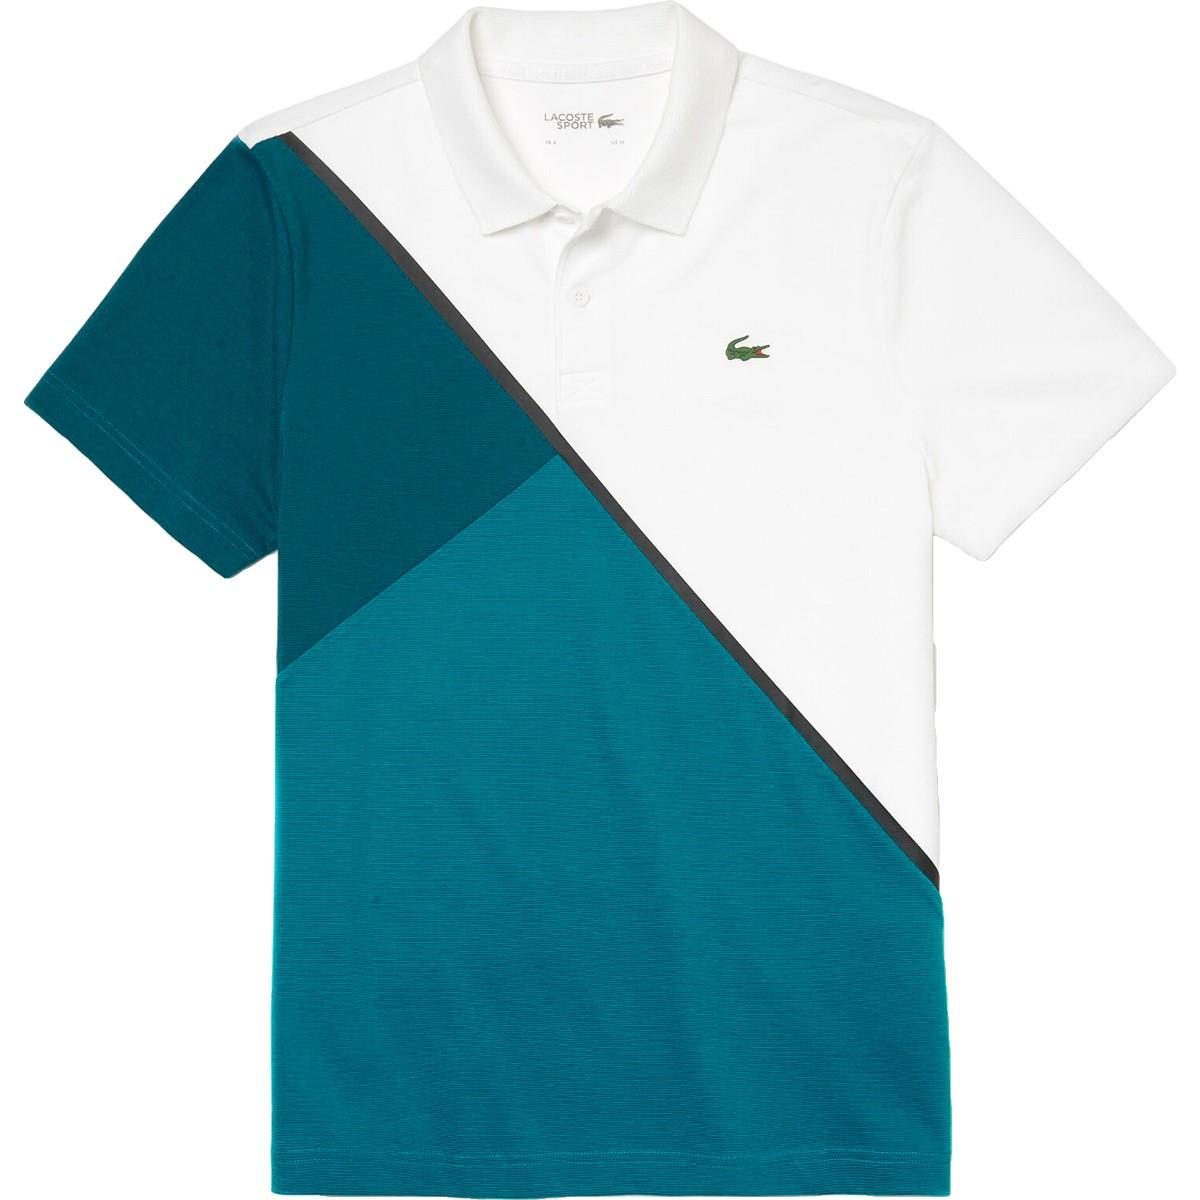 Polo Lacoste Lacoste Polo Tennis Homme Tennis VêtementsTennispro D9IWYEH2